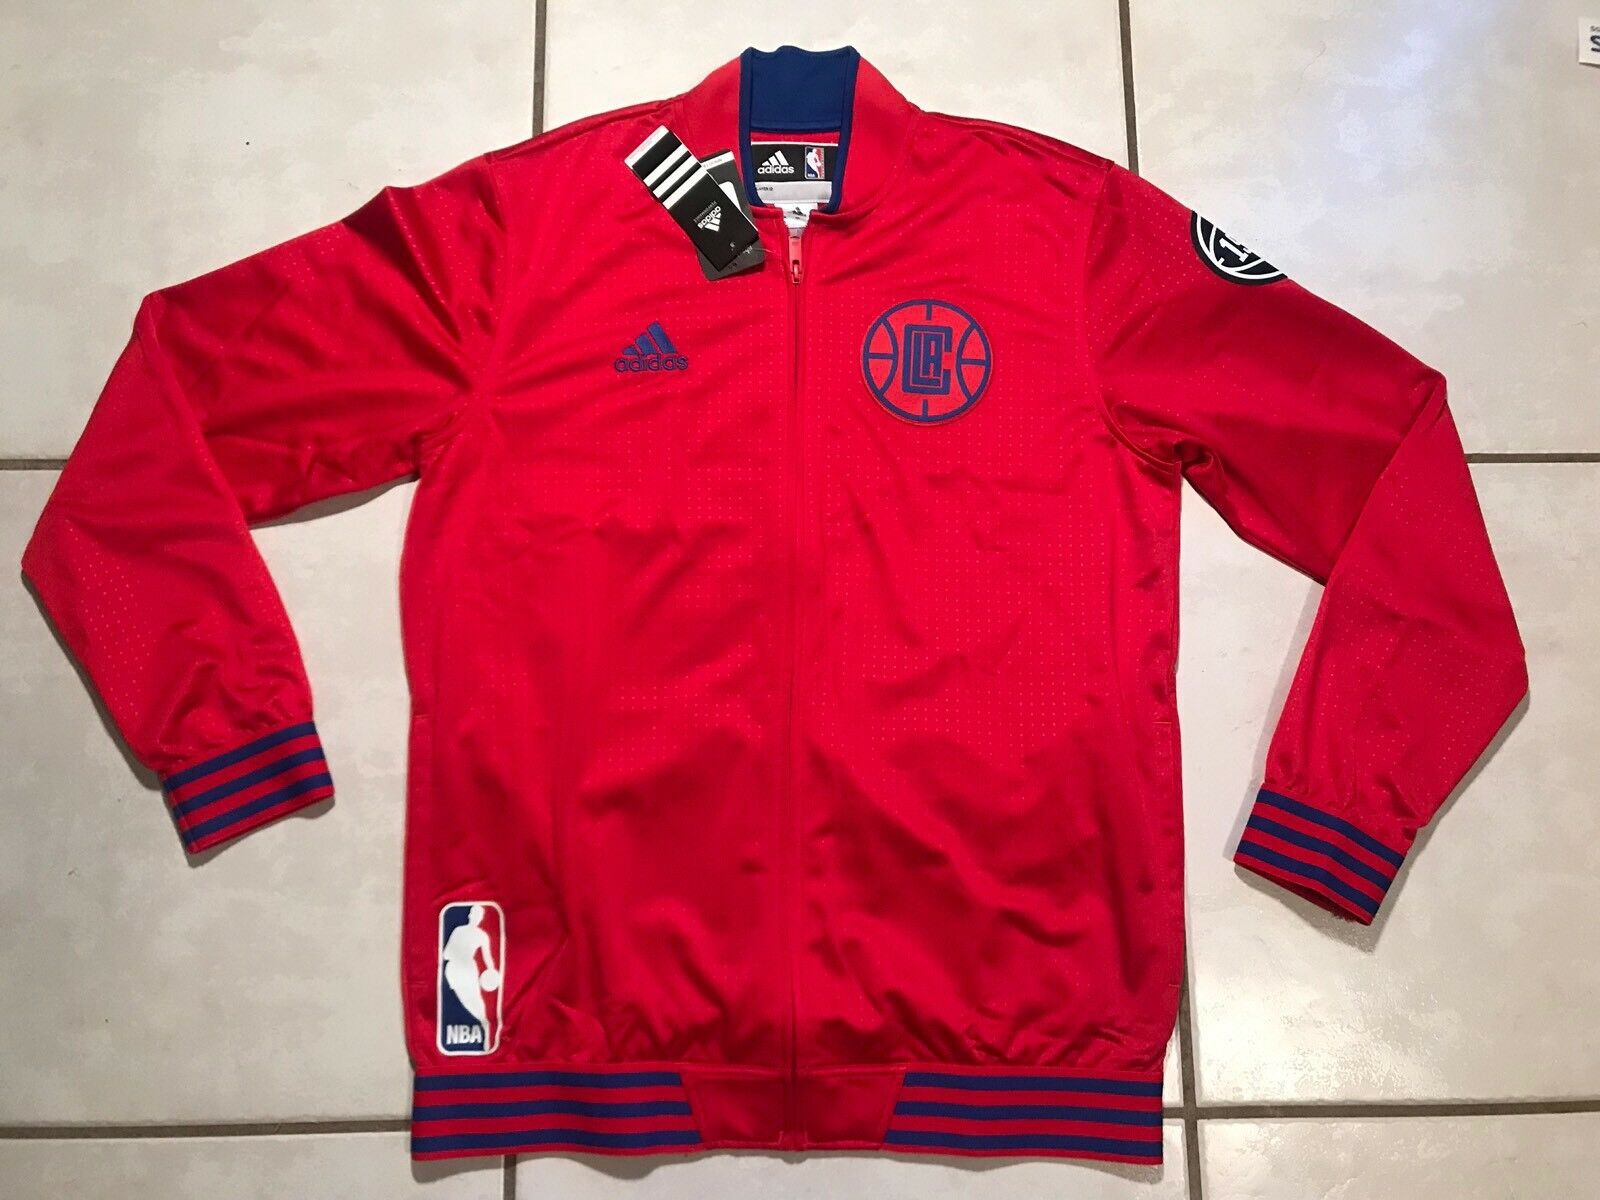 Bulls Chicago Originaux Nba Nwt De Adidas Rares cwZYOYqB